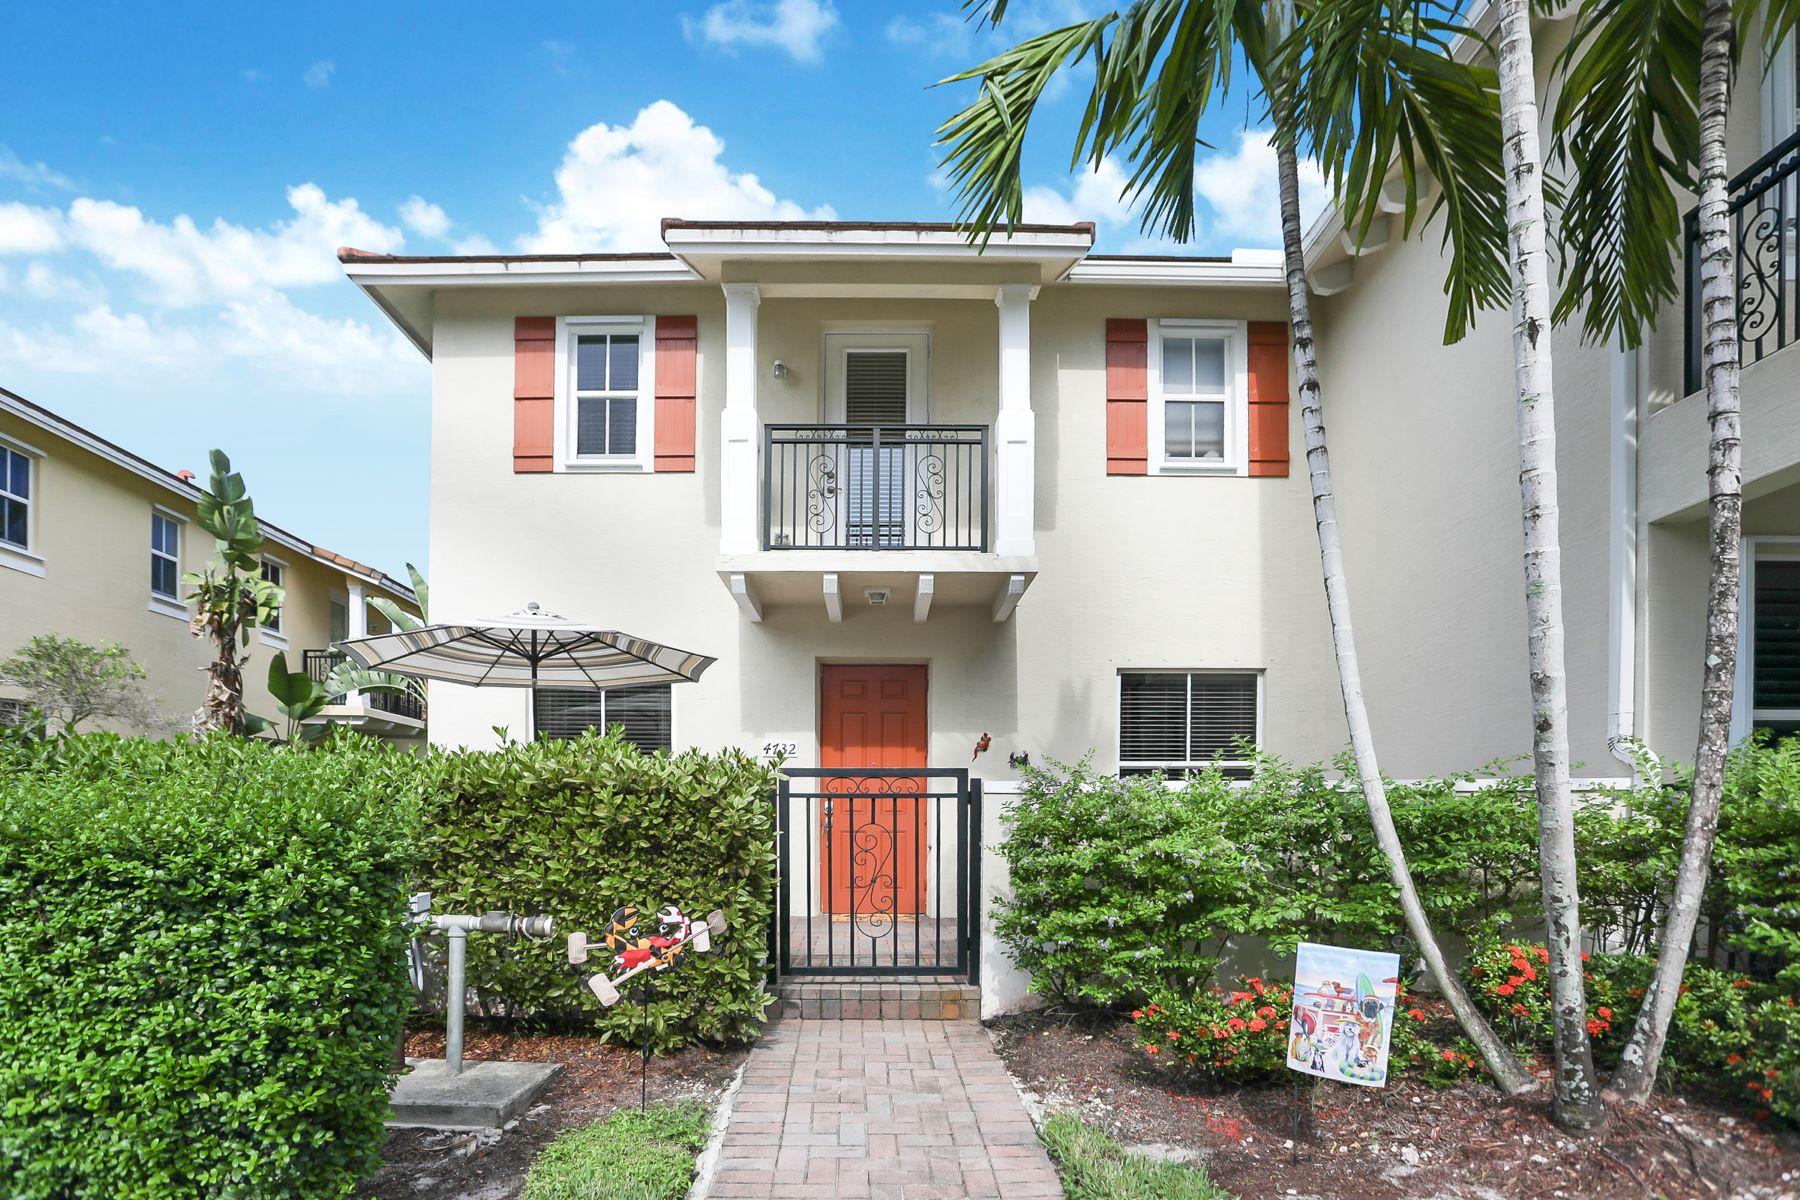 townhouses 為 出售 在 Coconut Creek, 佛羅里達州 33073 美國